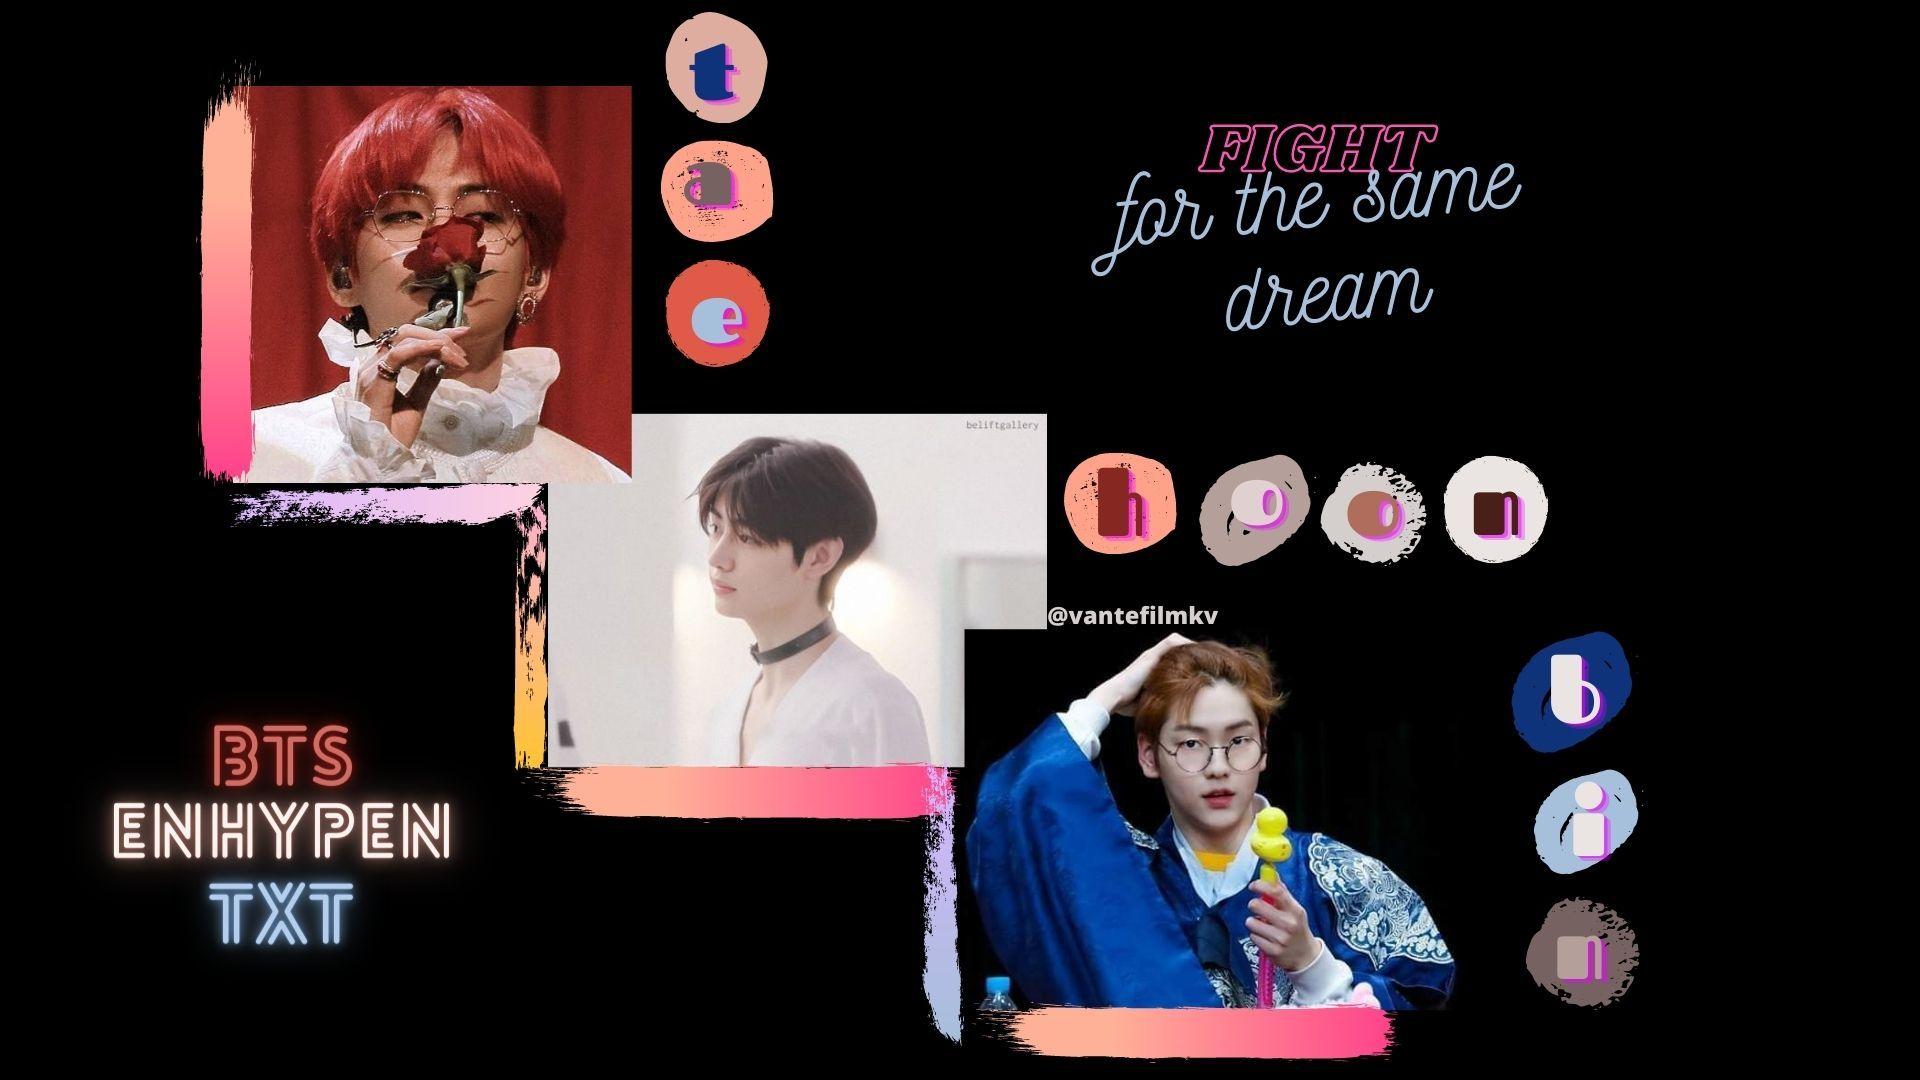 Kpop Boys Kim Taehyung Wallpaper Macbook Wallpaper Desktop Wallpaper Enhypen wallpaper aesthetic laptop